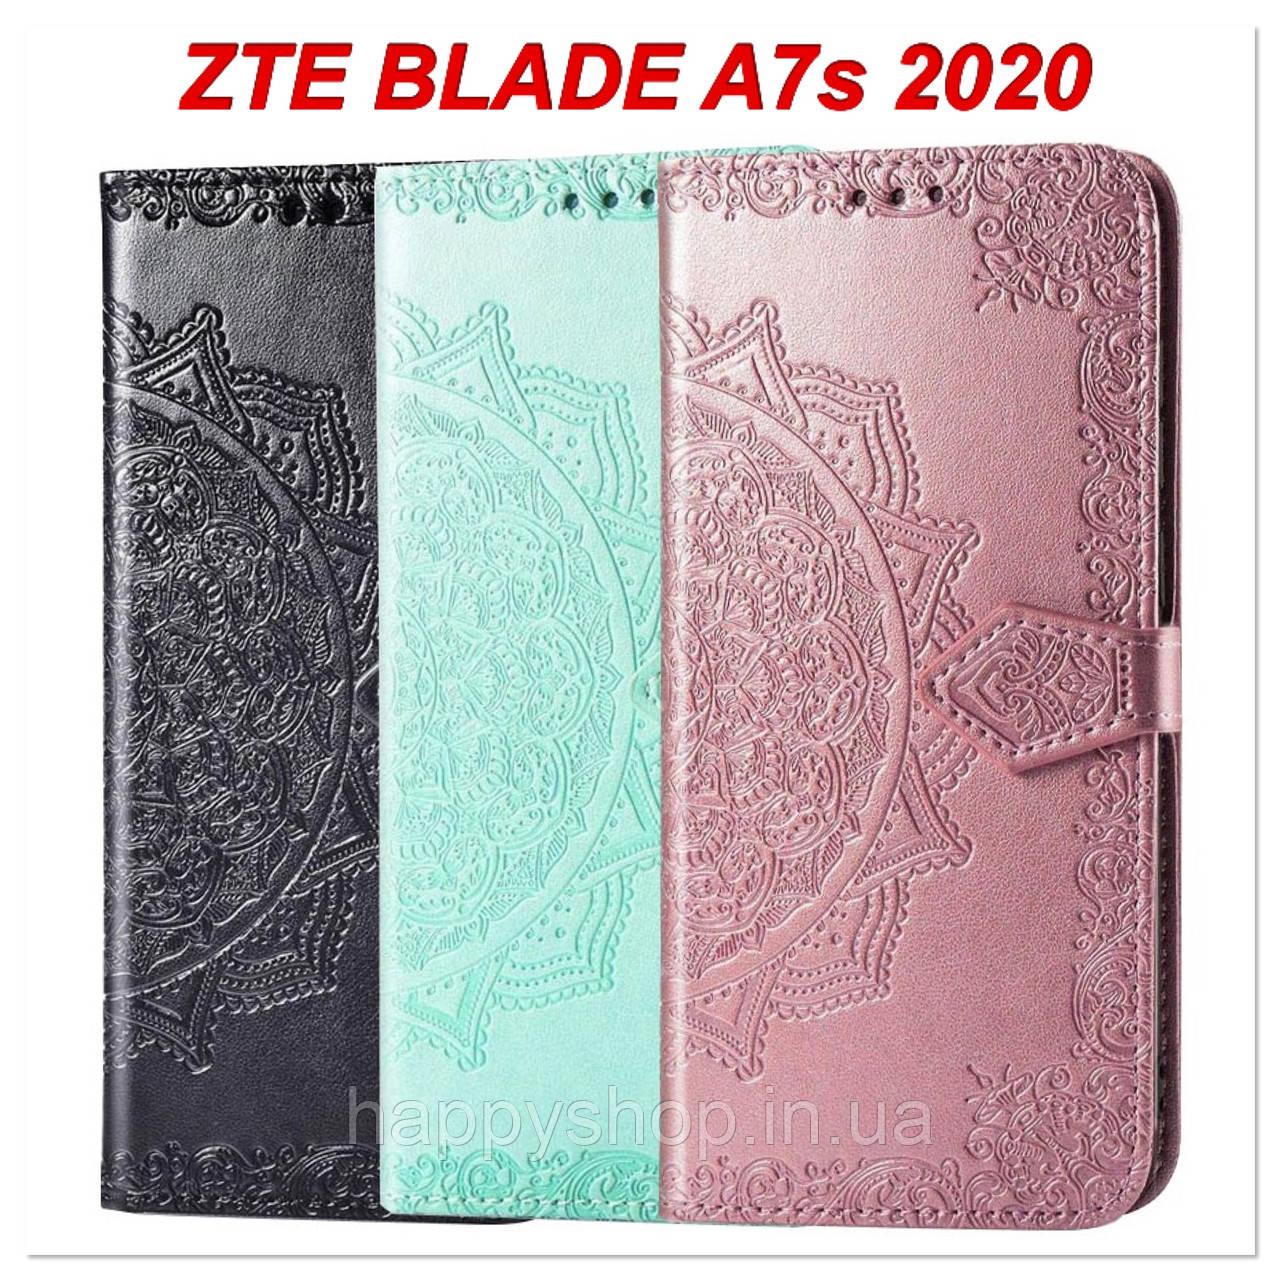 Чехол-книжка с визитницей для ZTE Blade A7s 2020